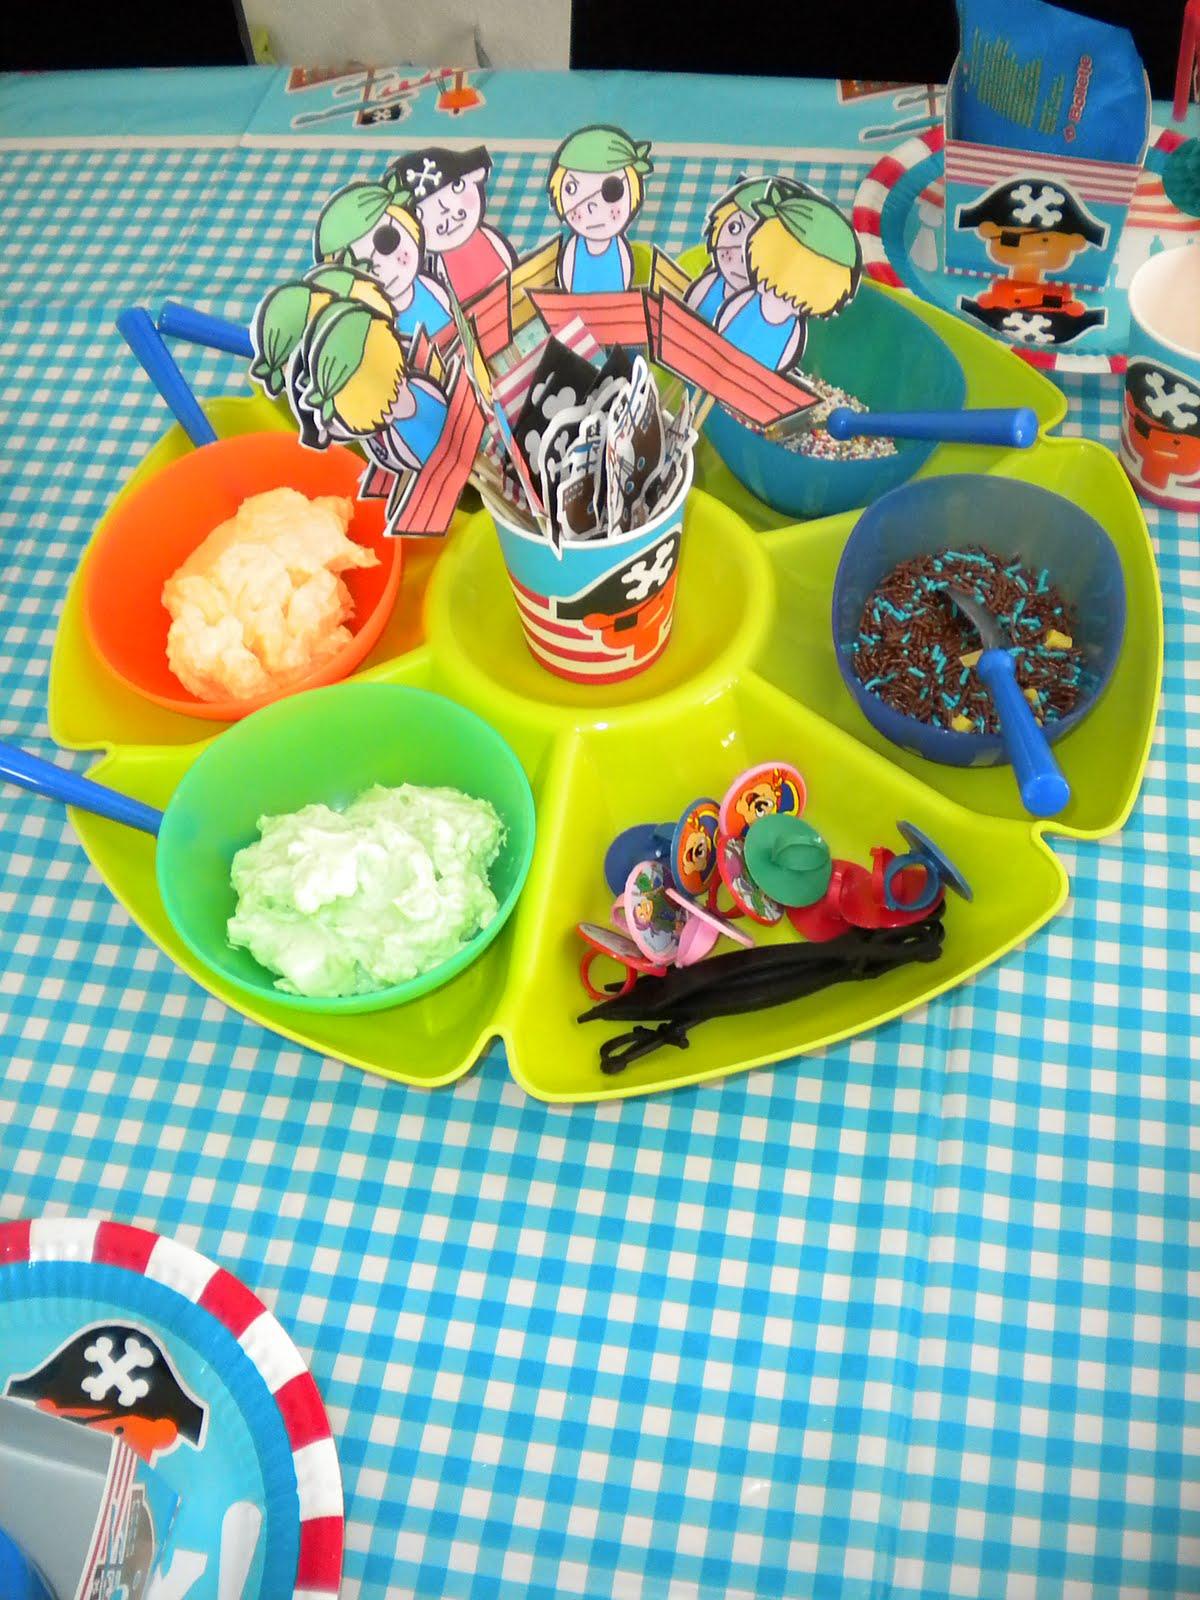 Cakes Joy Eerste Kinderfeestje